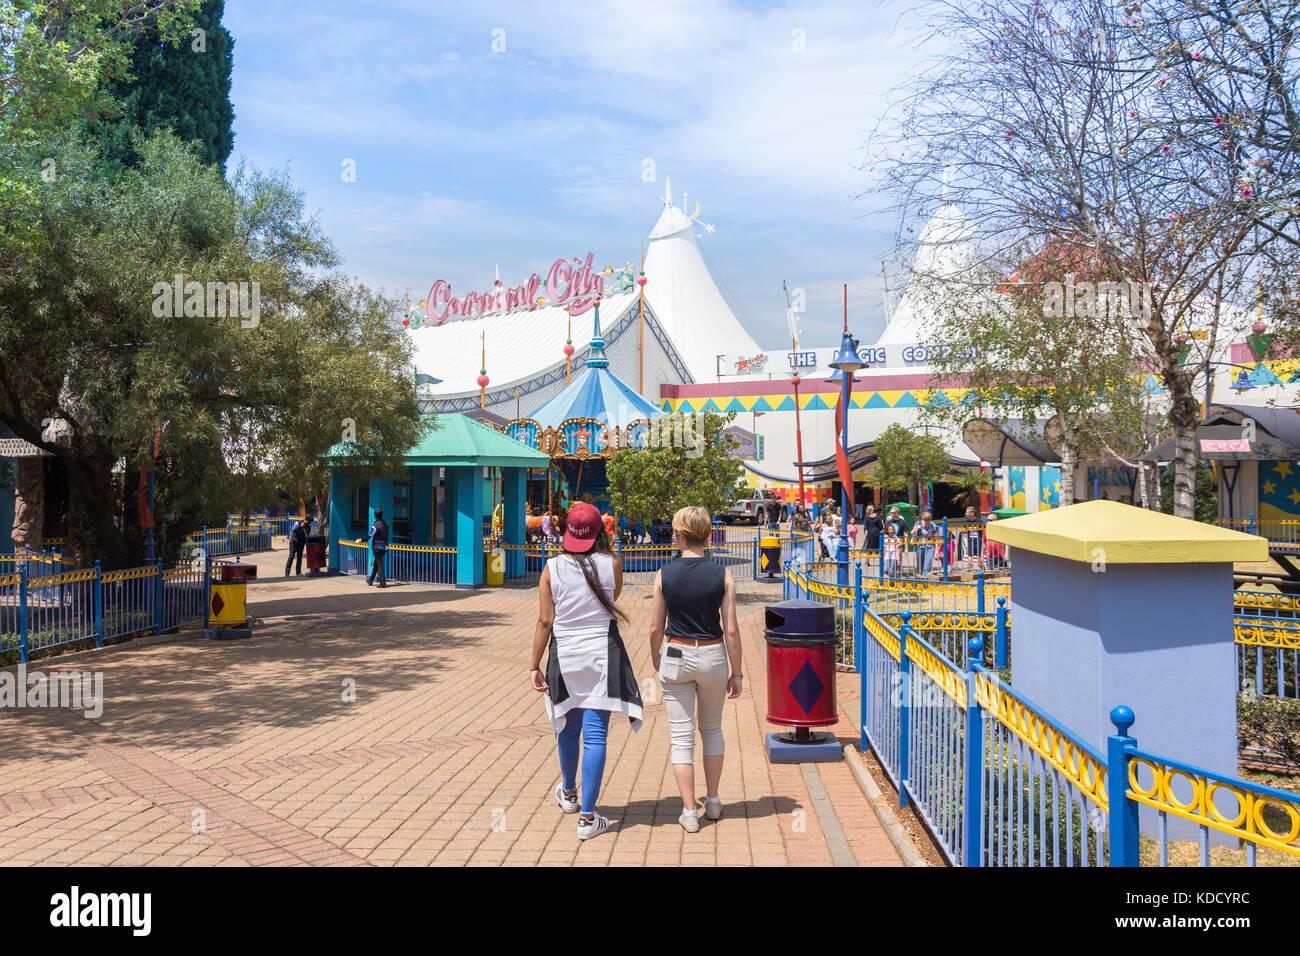 Expositions à Carnival City Casino & Entertainment World, Brakpan, East Rand, le grand Johannesburg, Gauteng, Photo Stock